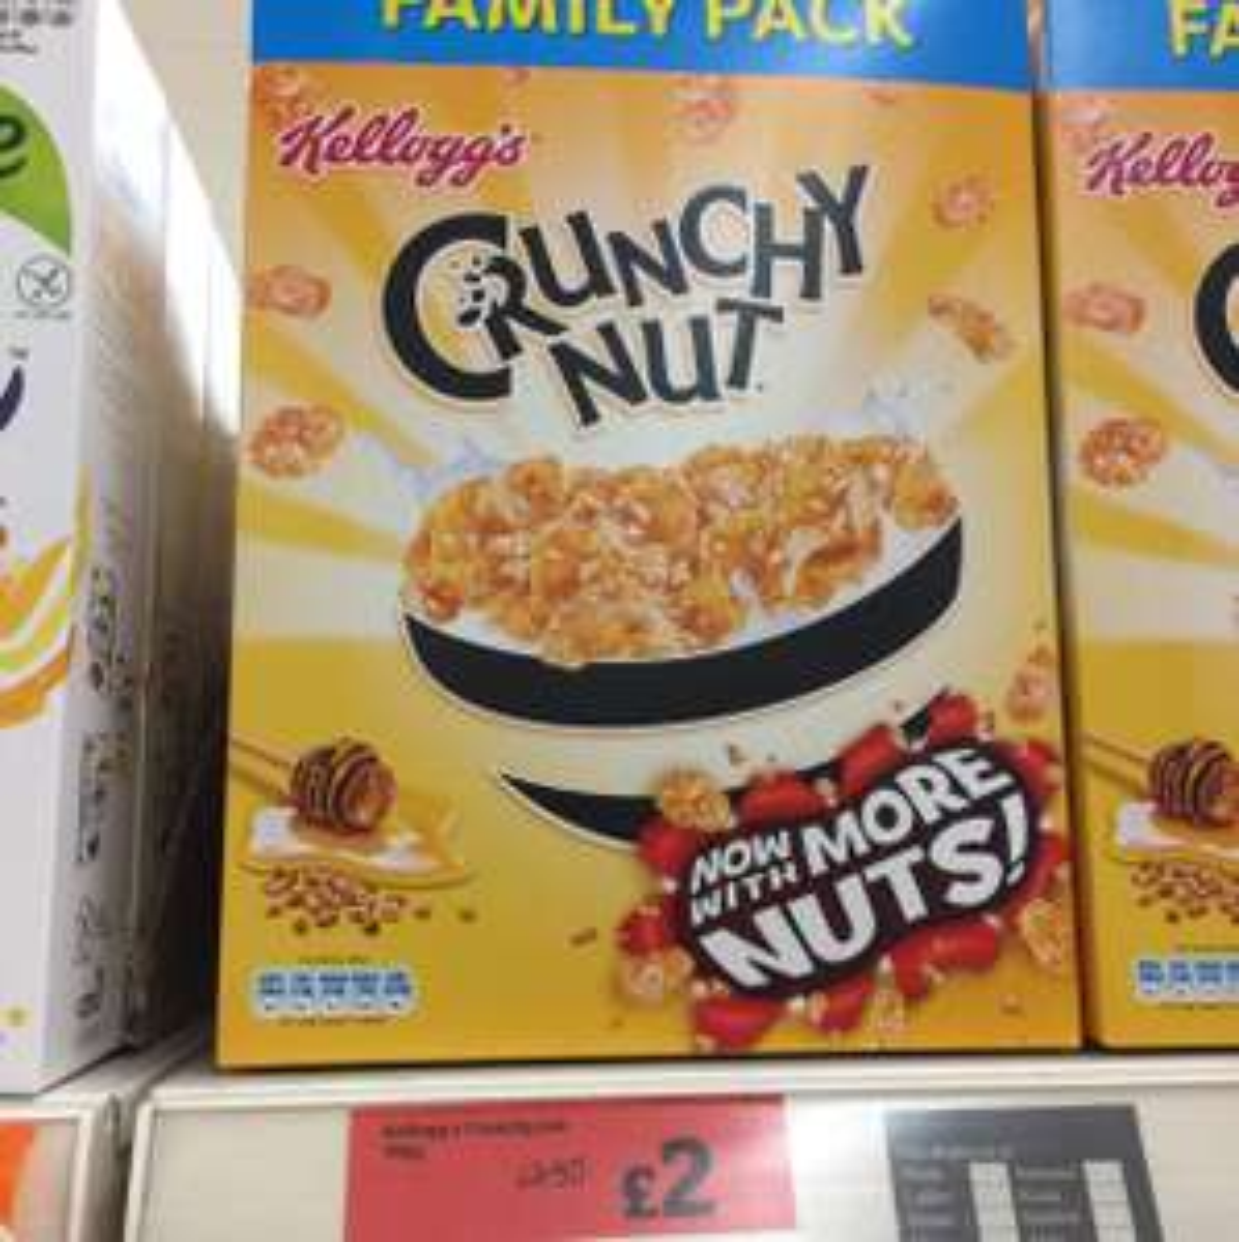 Kellogg's Crunchies at Sainsbury's for £2